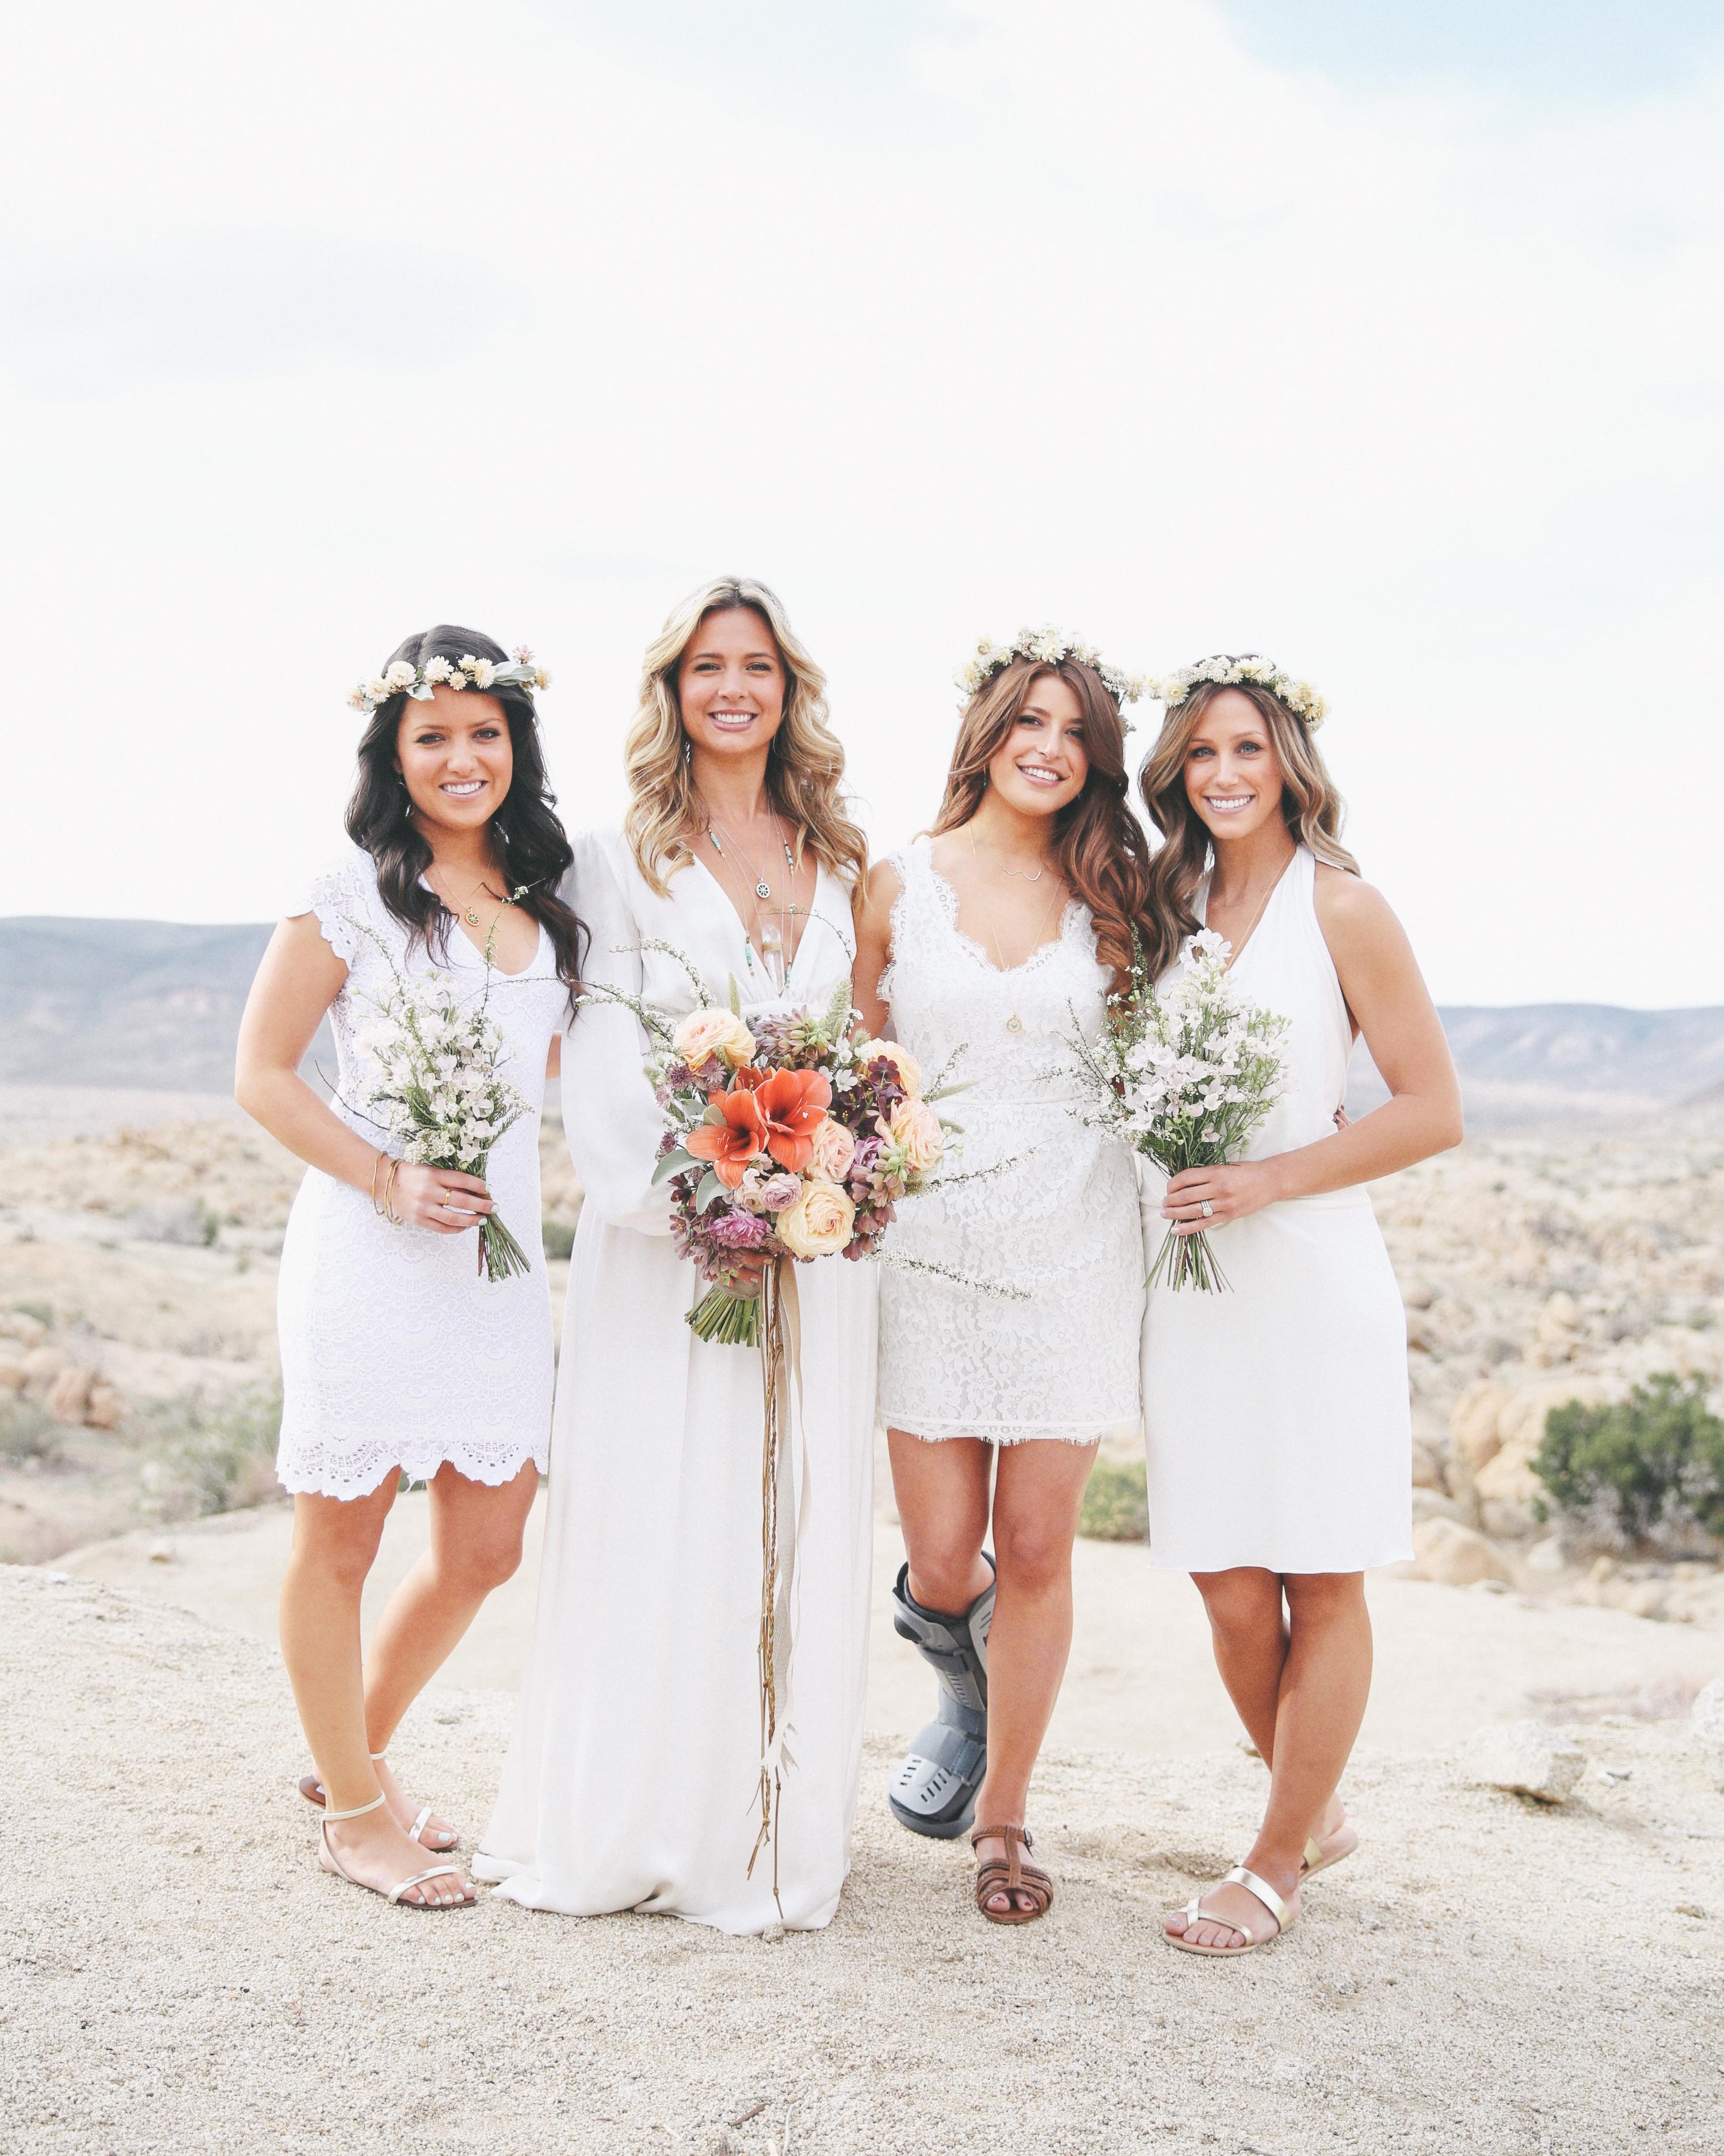 christen-billy-wedding-bridesmaids-108-011-s111597-1014.jpg